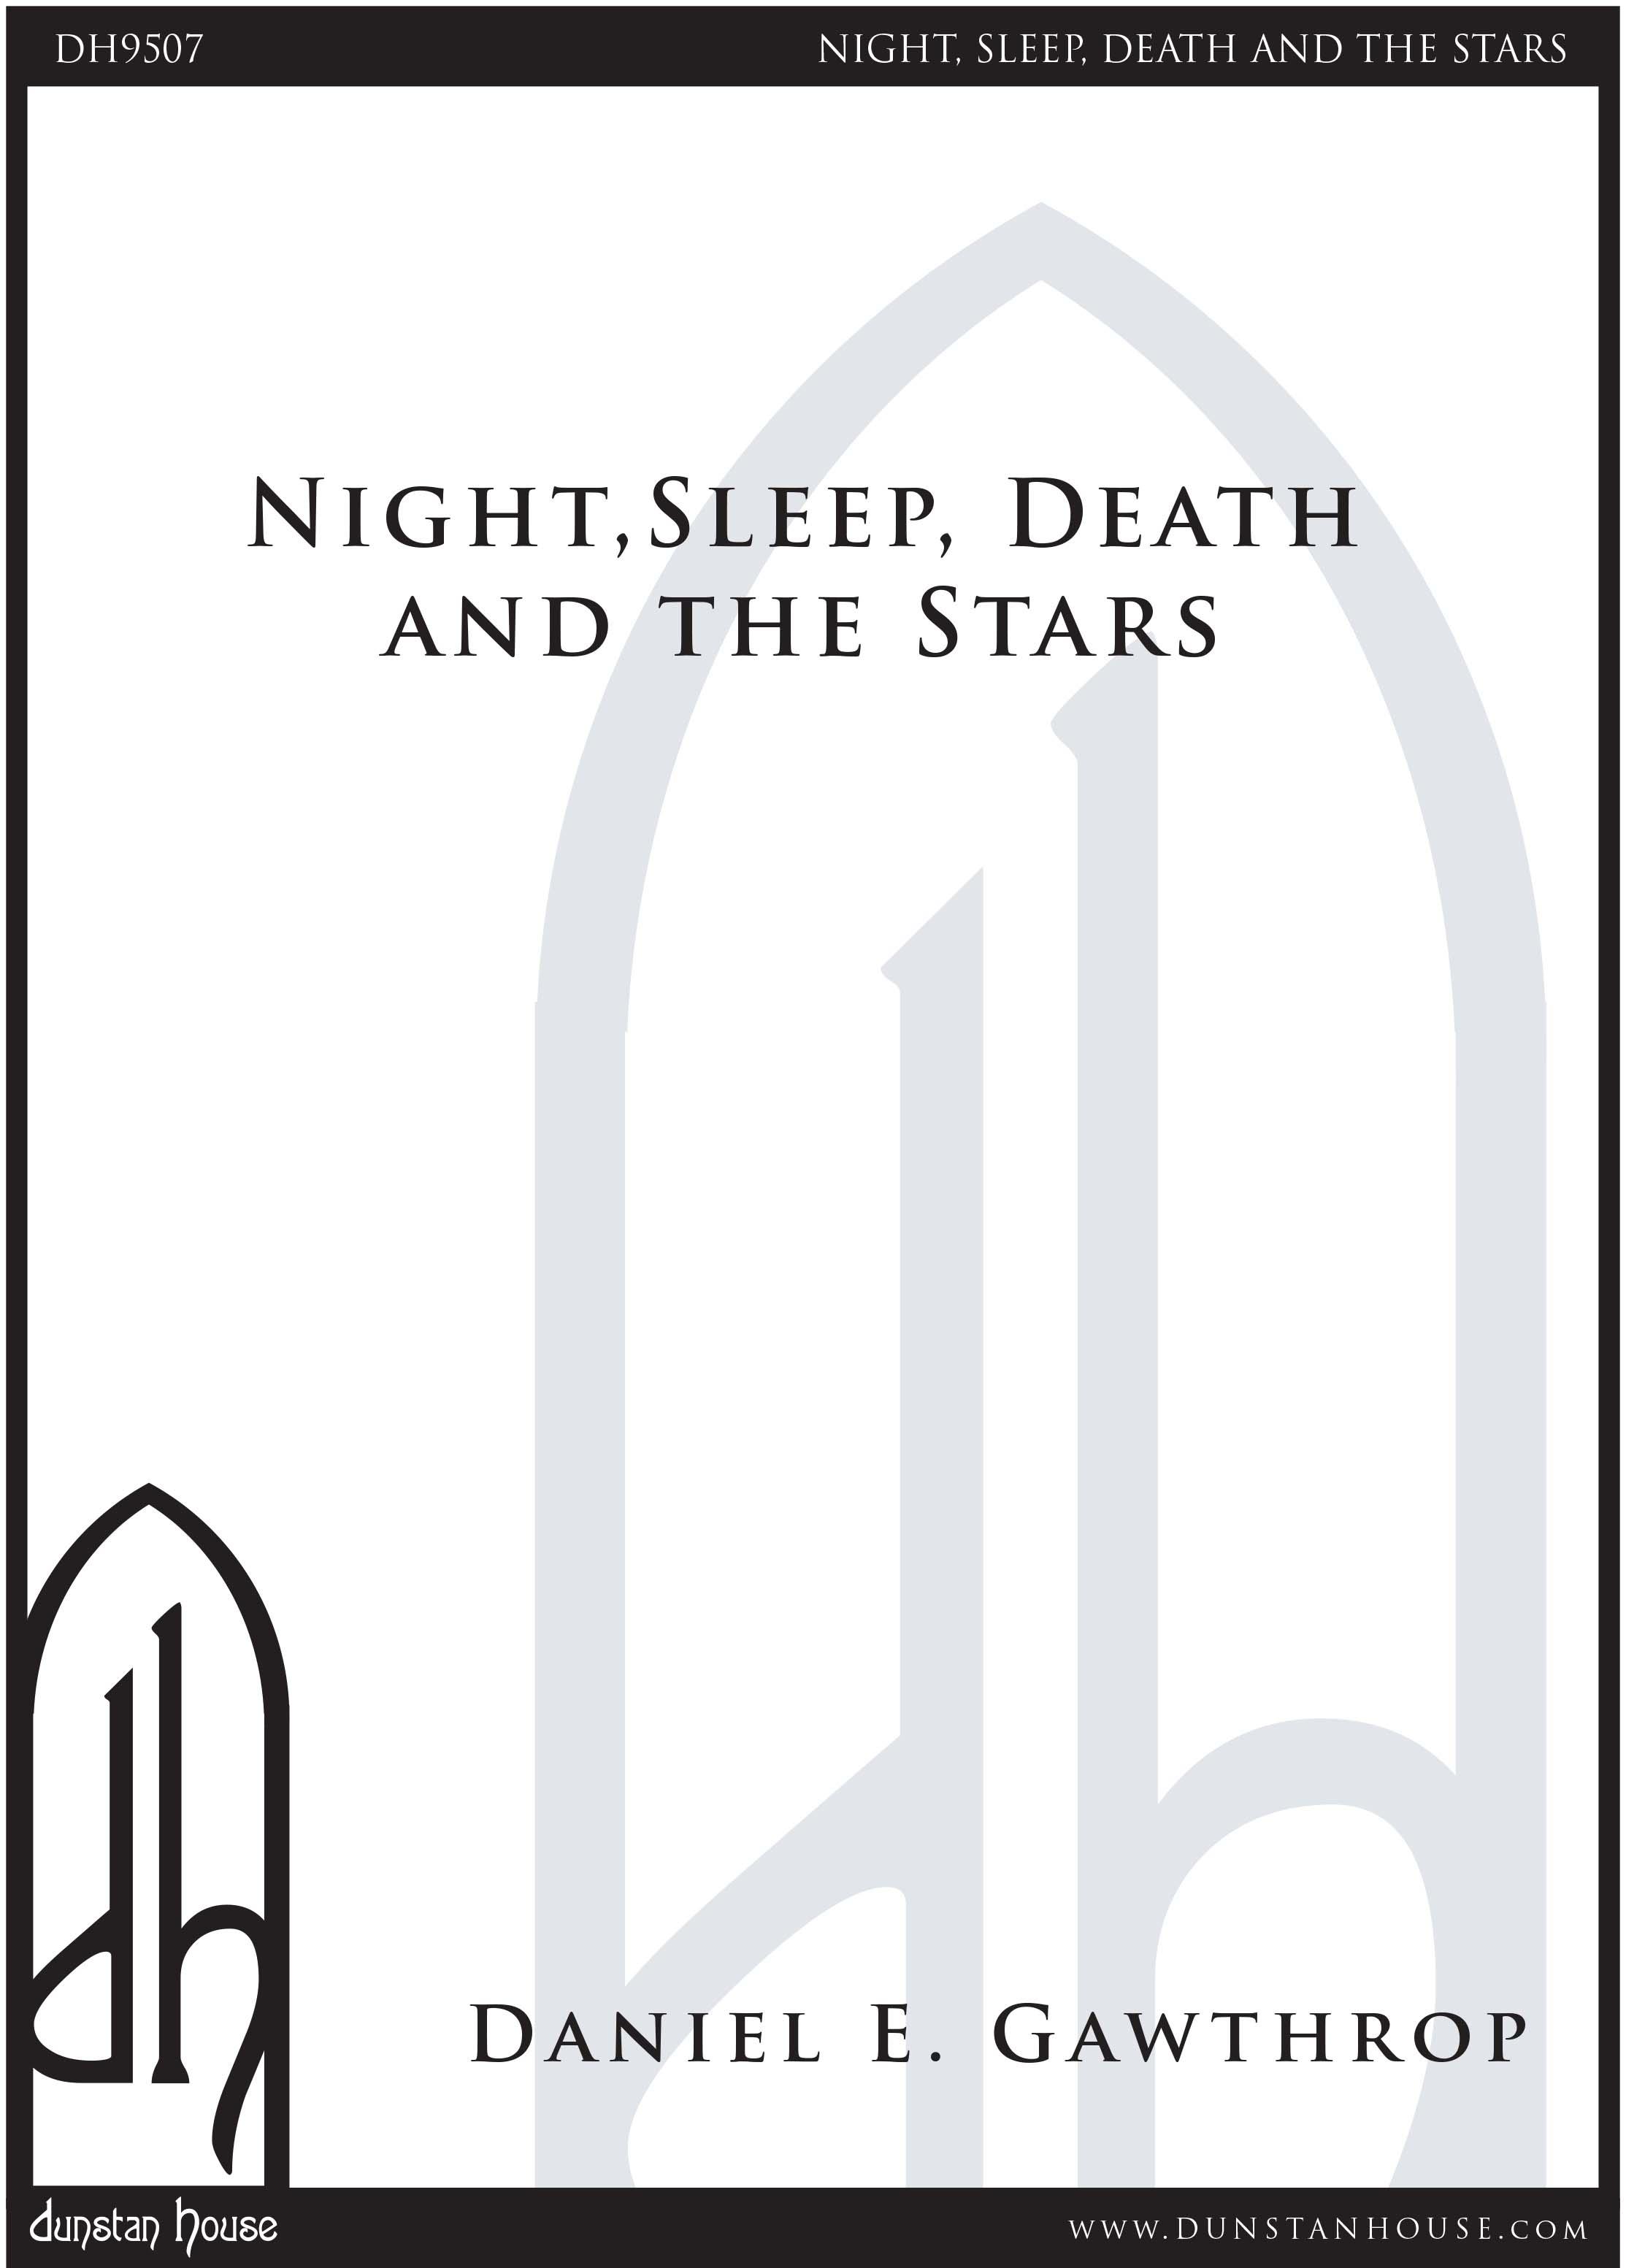 Night, Sleep, Death and the Stars